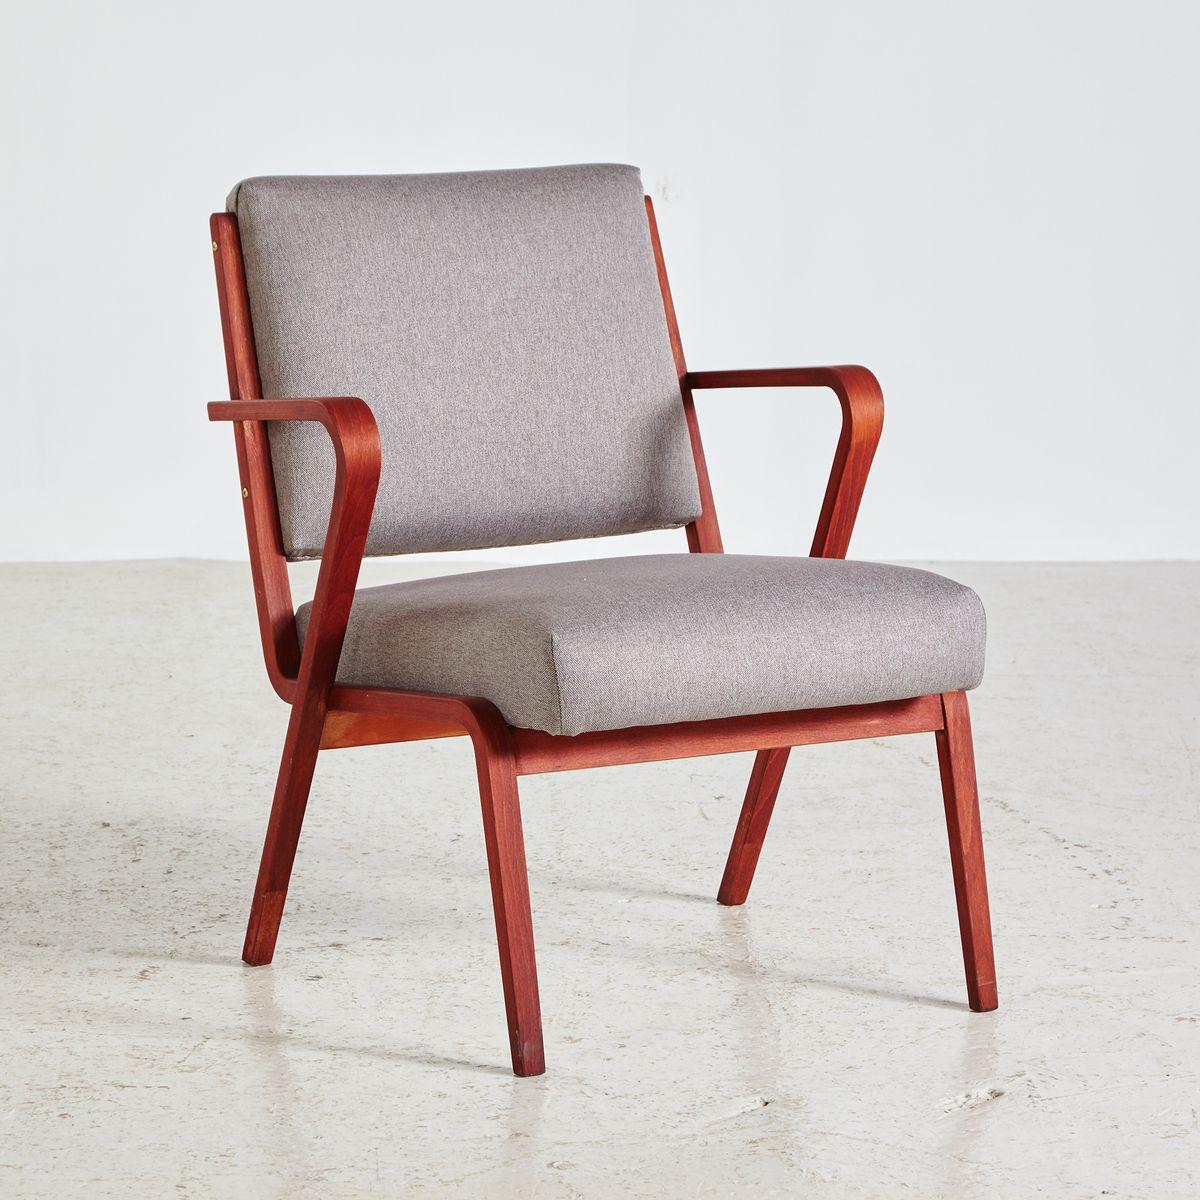 modell 53693 sessel von selman selmanagic f r veb 1960er bei pamono kaufen. Black Bedroom Furniture Sets. Home Design Ideas